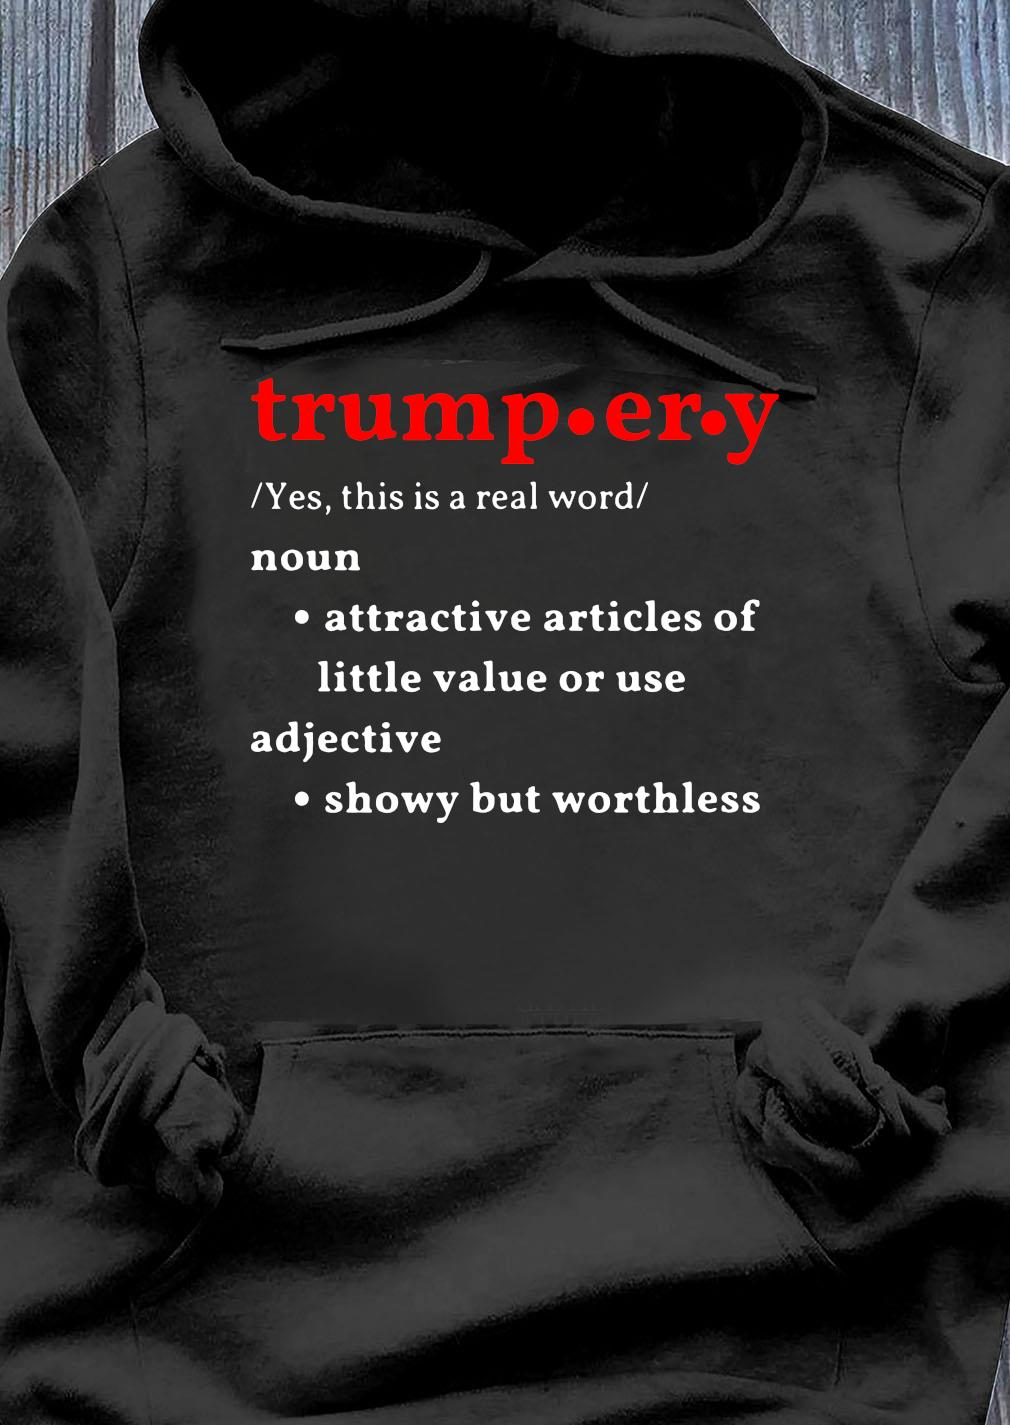 Trump-Er-Y Definition Shirt Hoodie